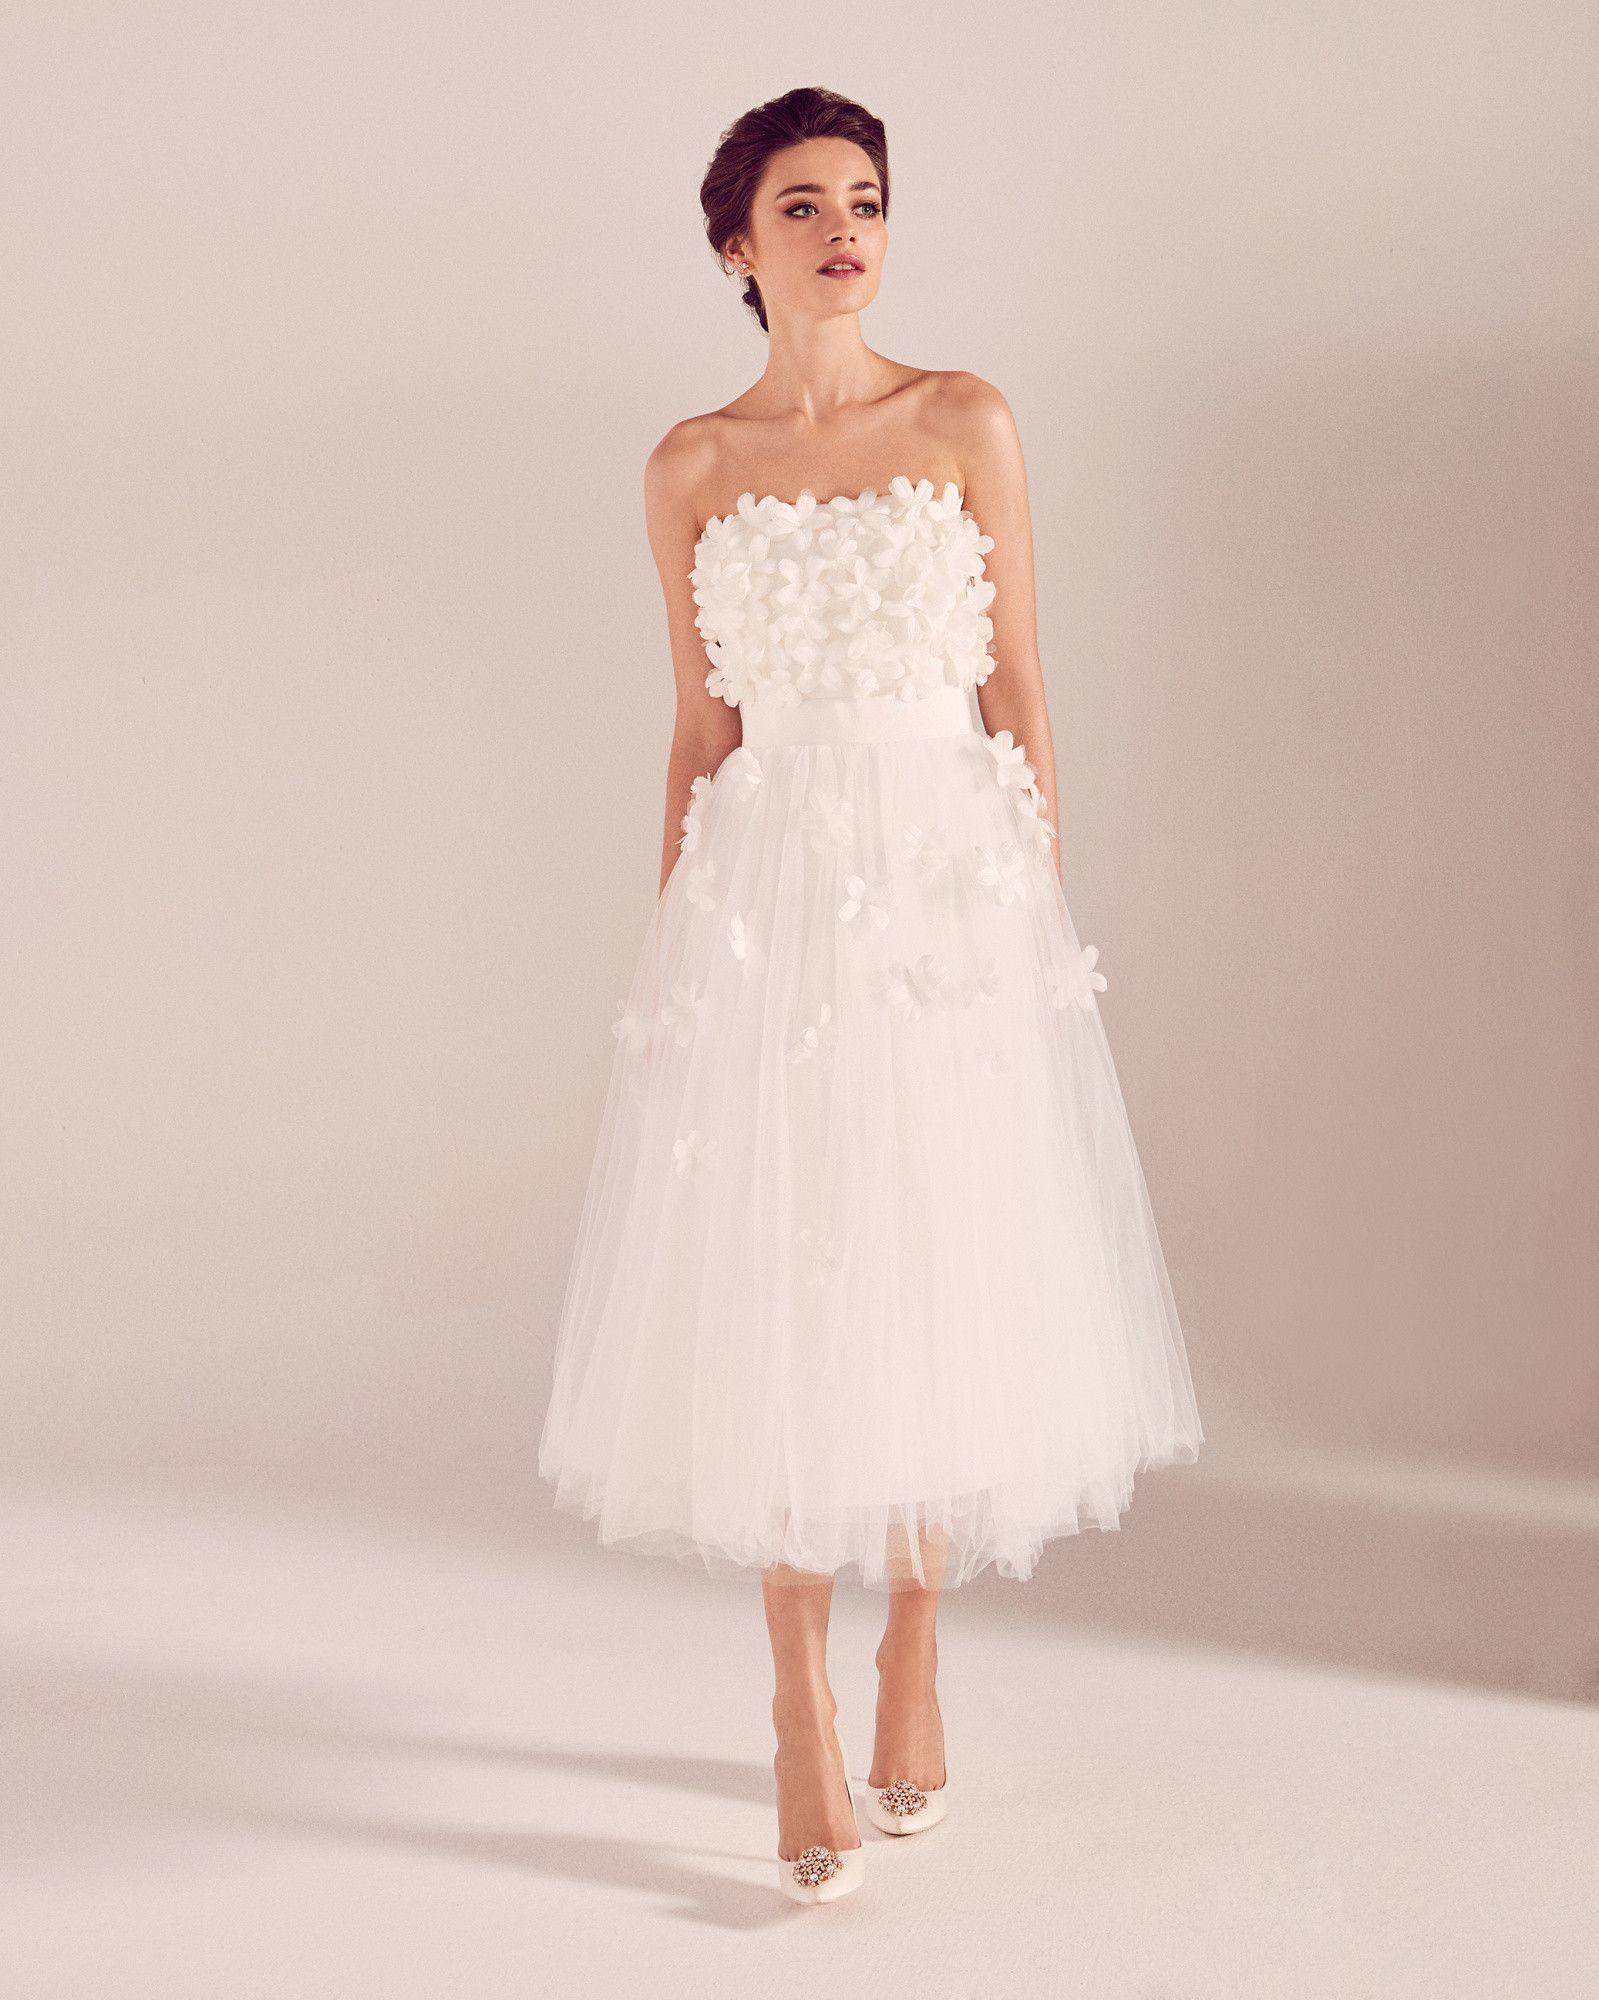 Floral Applique Tulle Bridal Dress White Wedding Dresses Ted Baker Uk Designer Outfits Woman Bridal Dresses Dresses